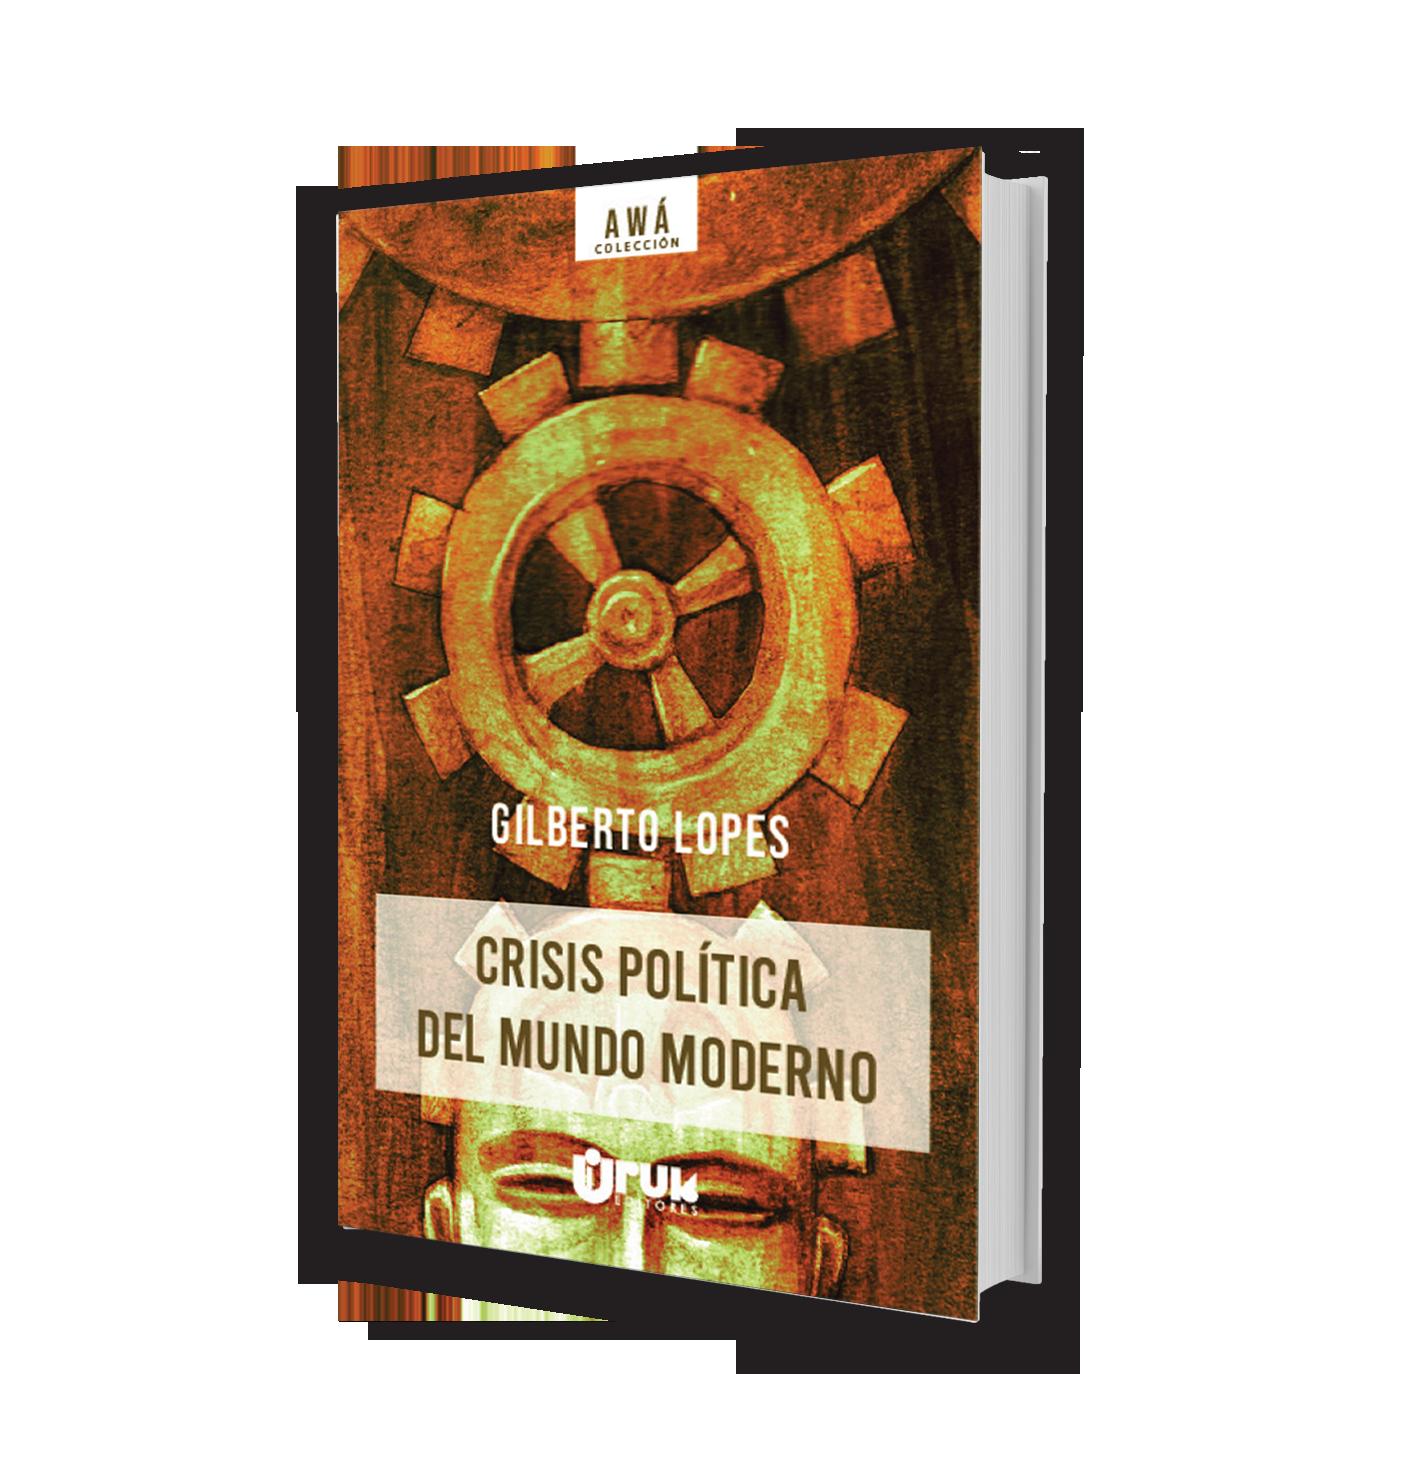 Crisis política del mundo moderno